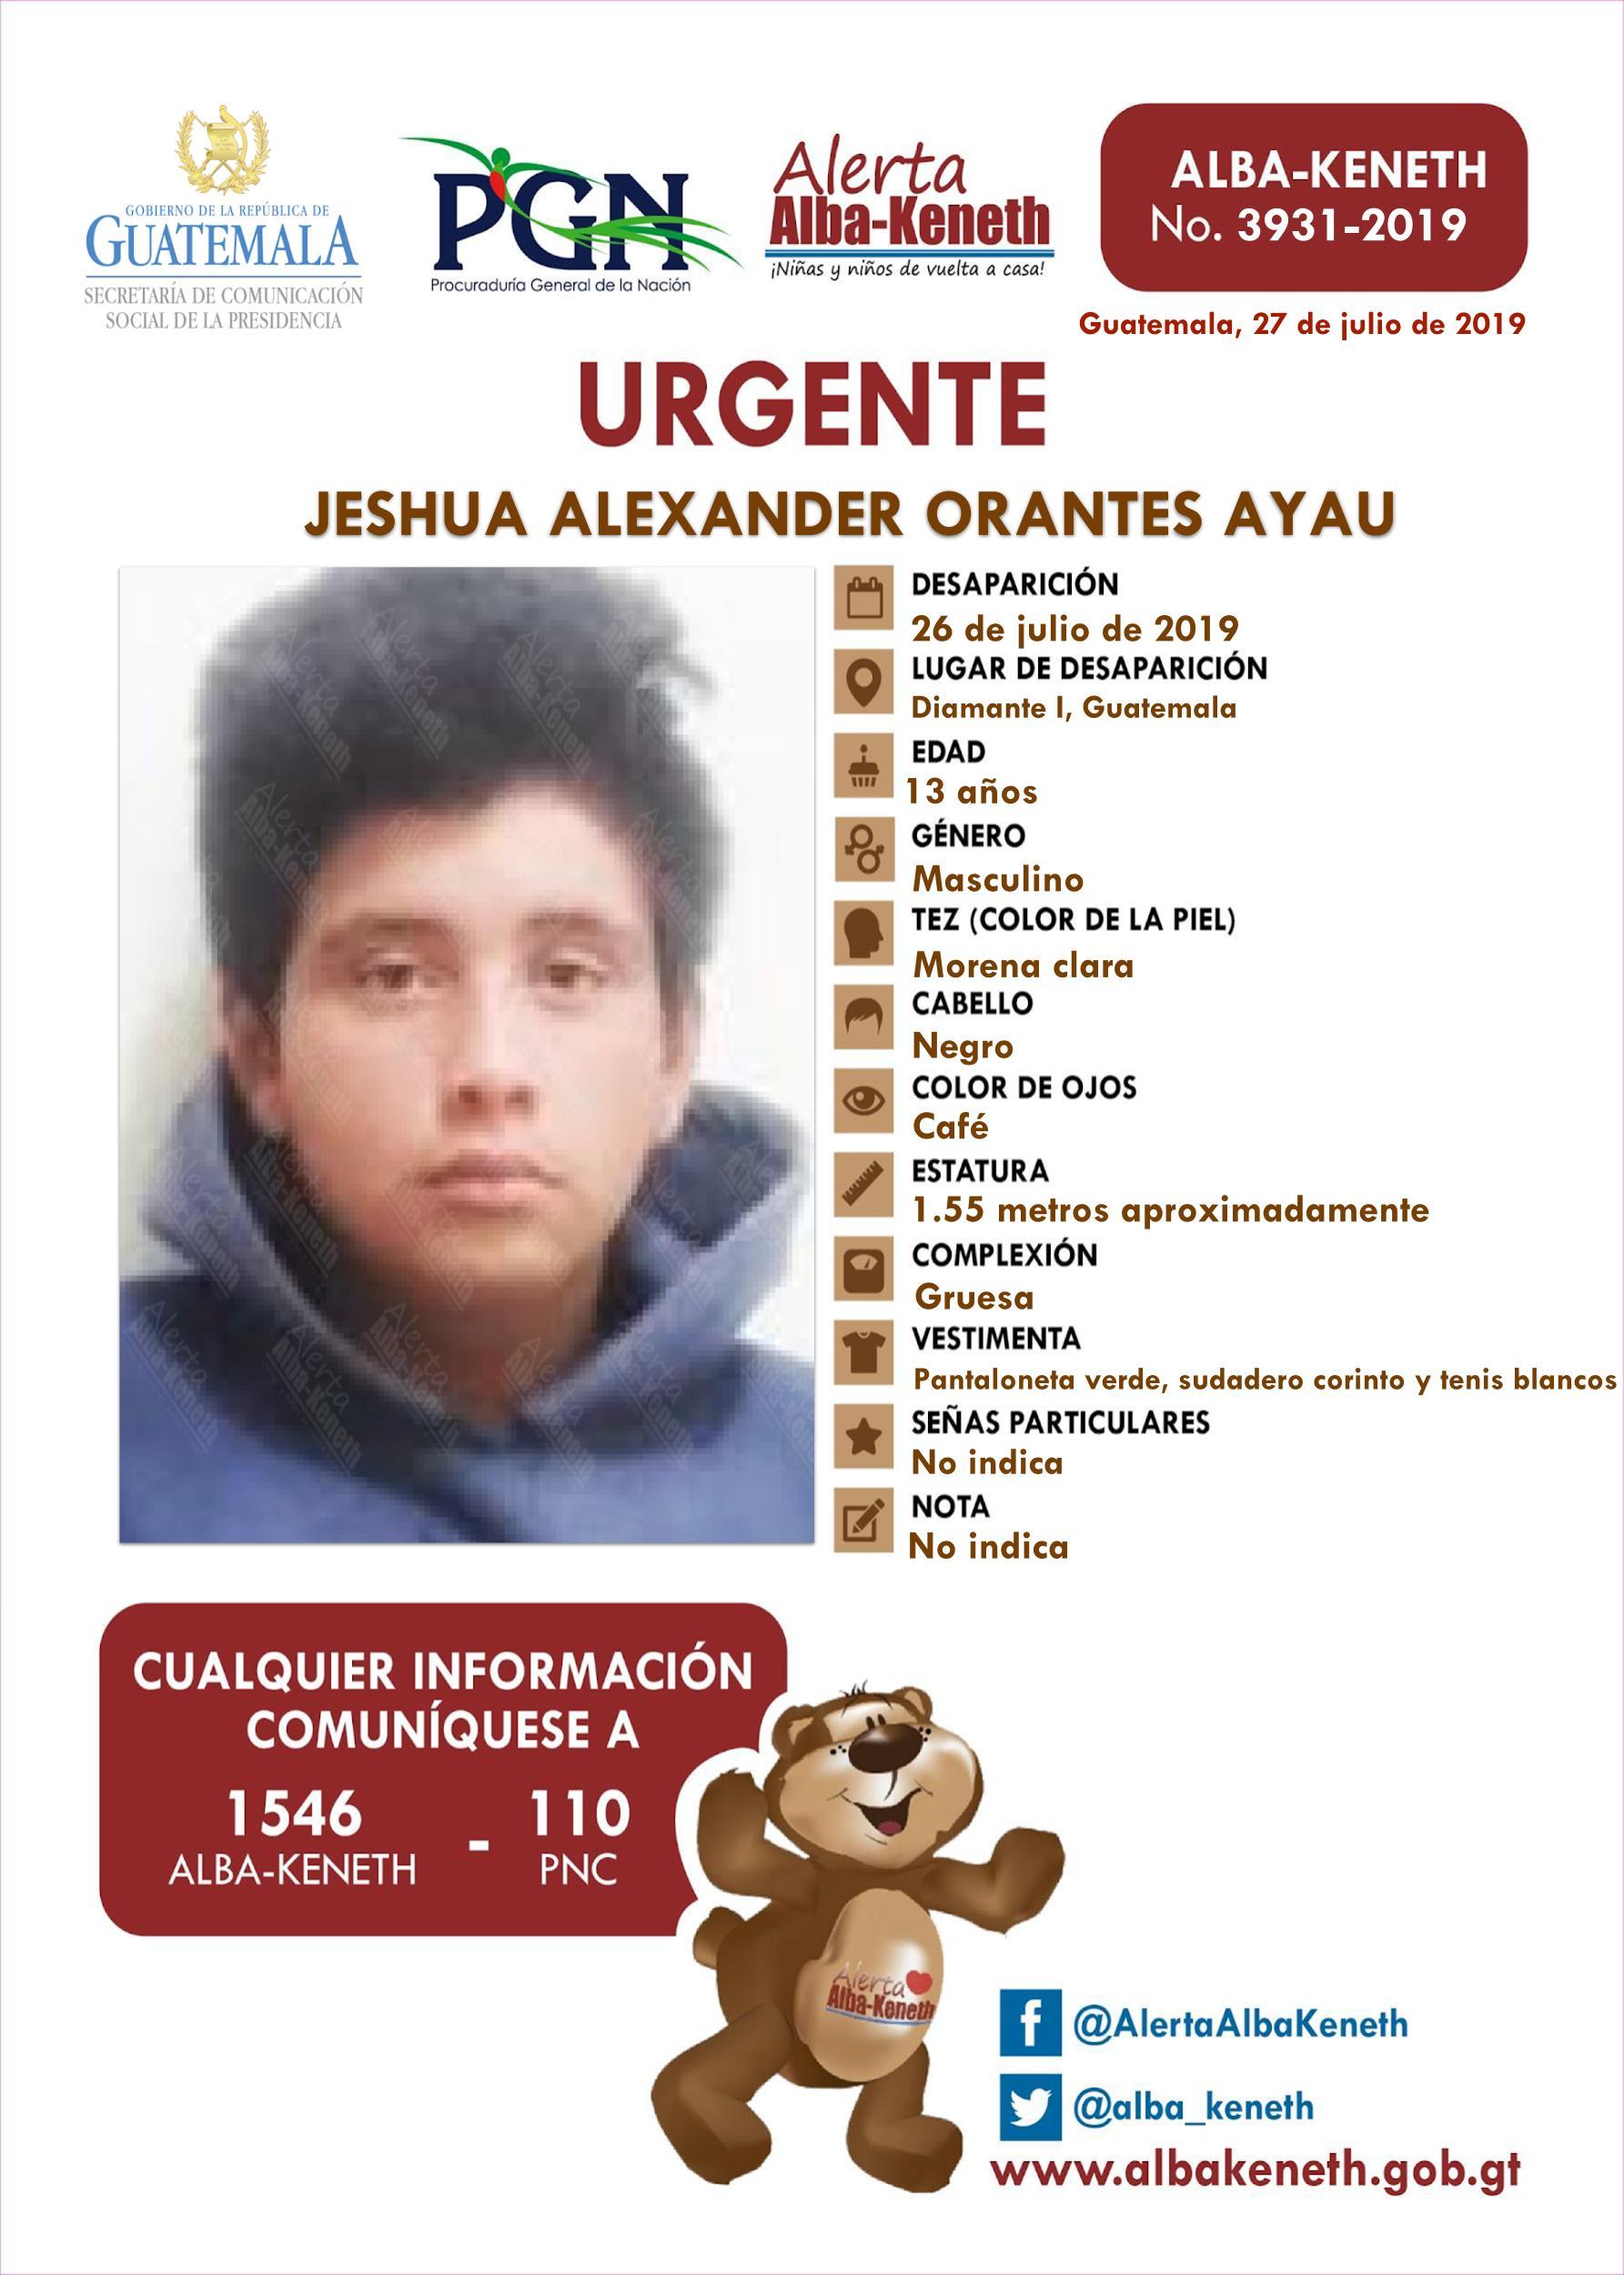 Jeshua Alexander Orantes Ayau